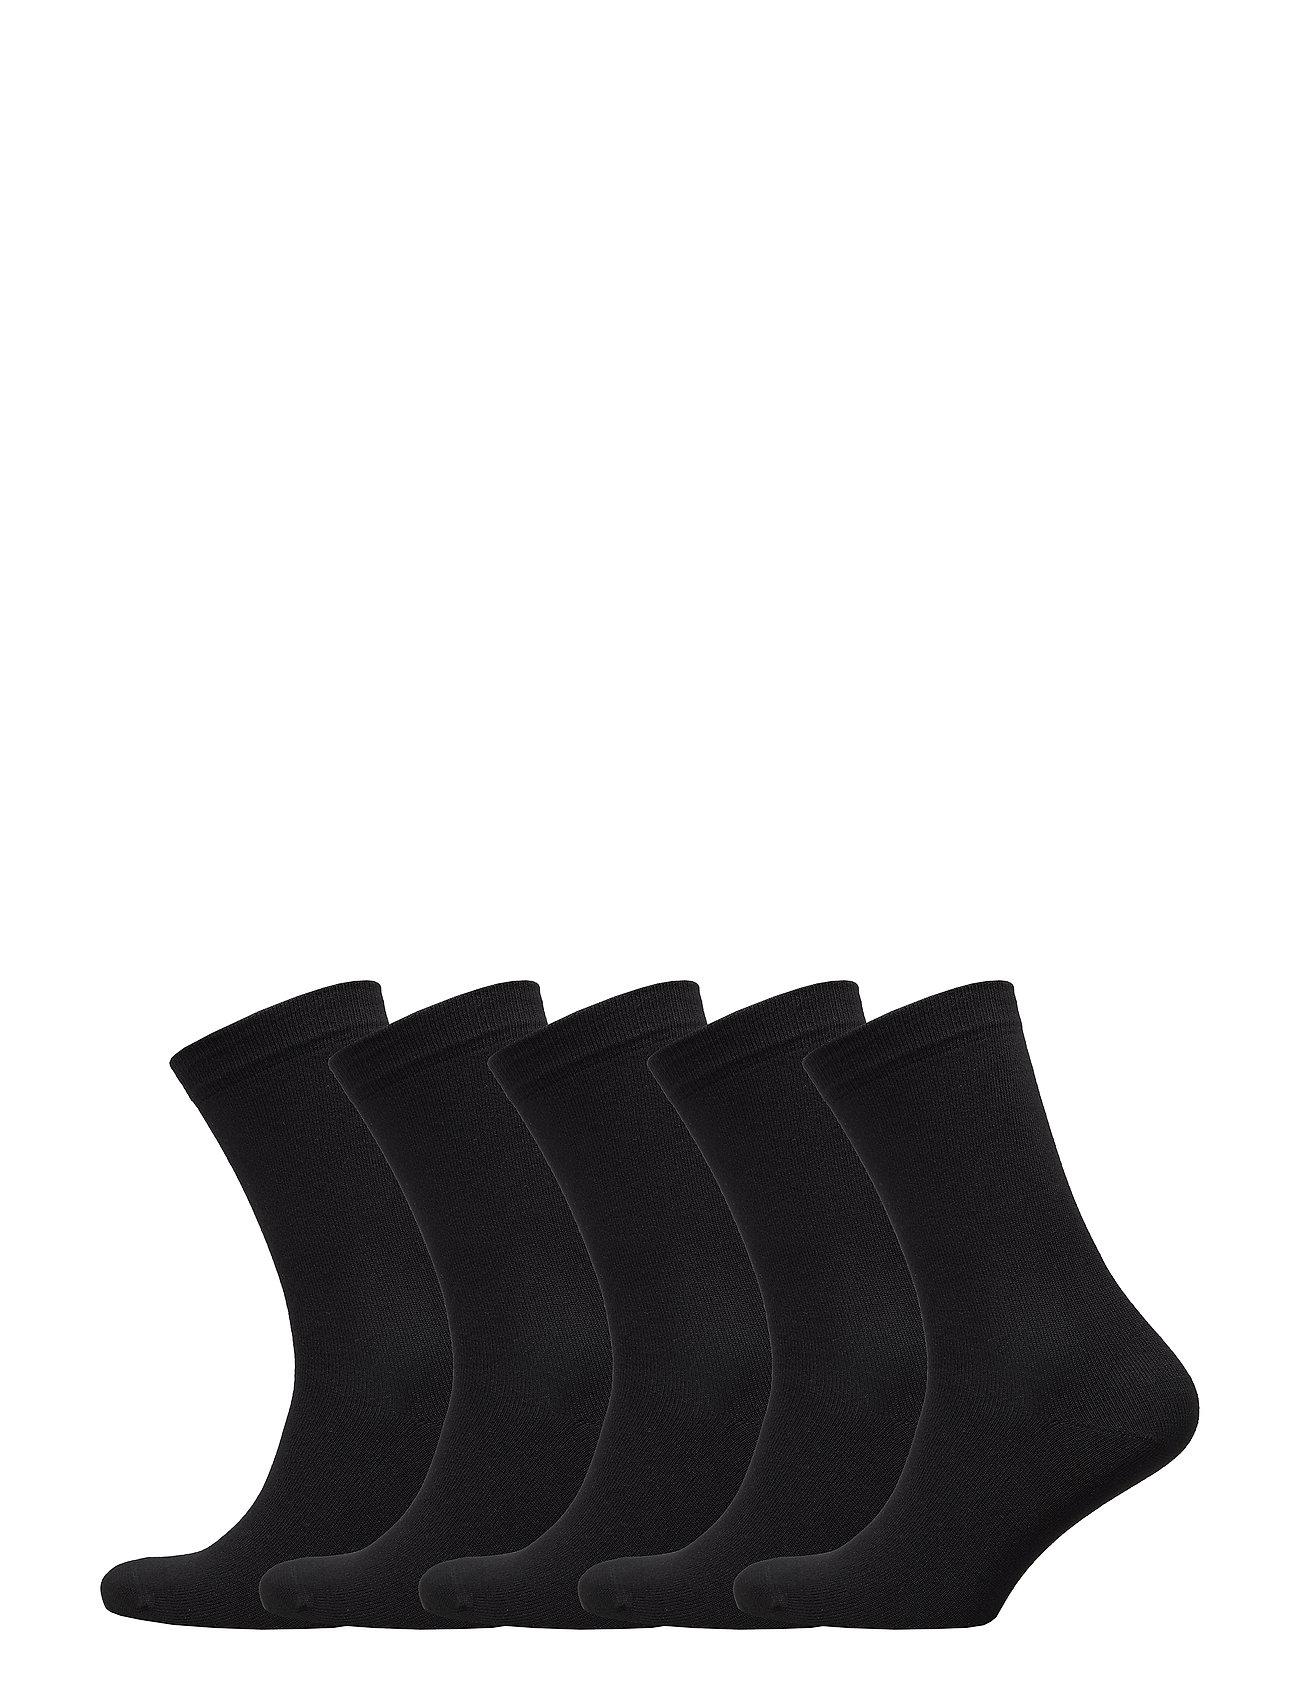 Image of ResteröDs, Bamboo 5-Pack Underwear Socks Regular Socks Sort Resteröds (3442838601)